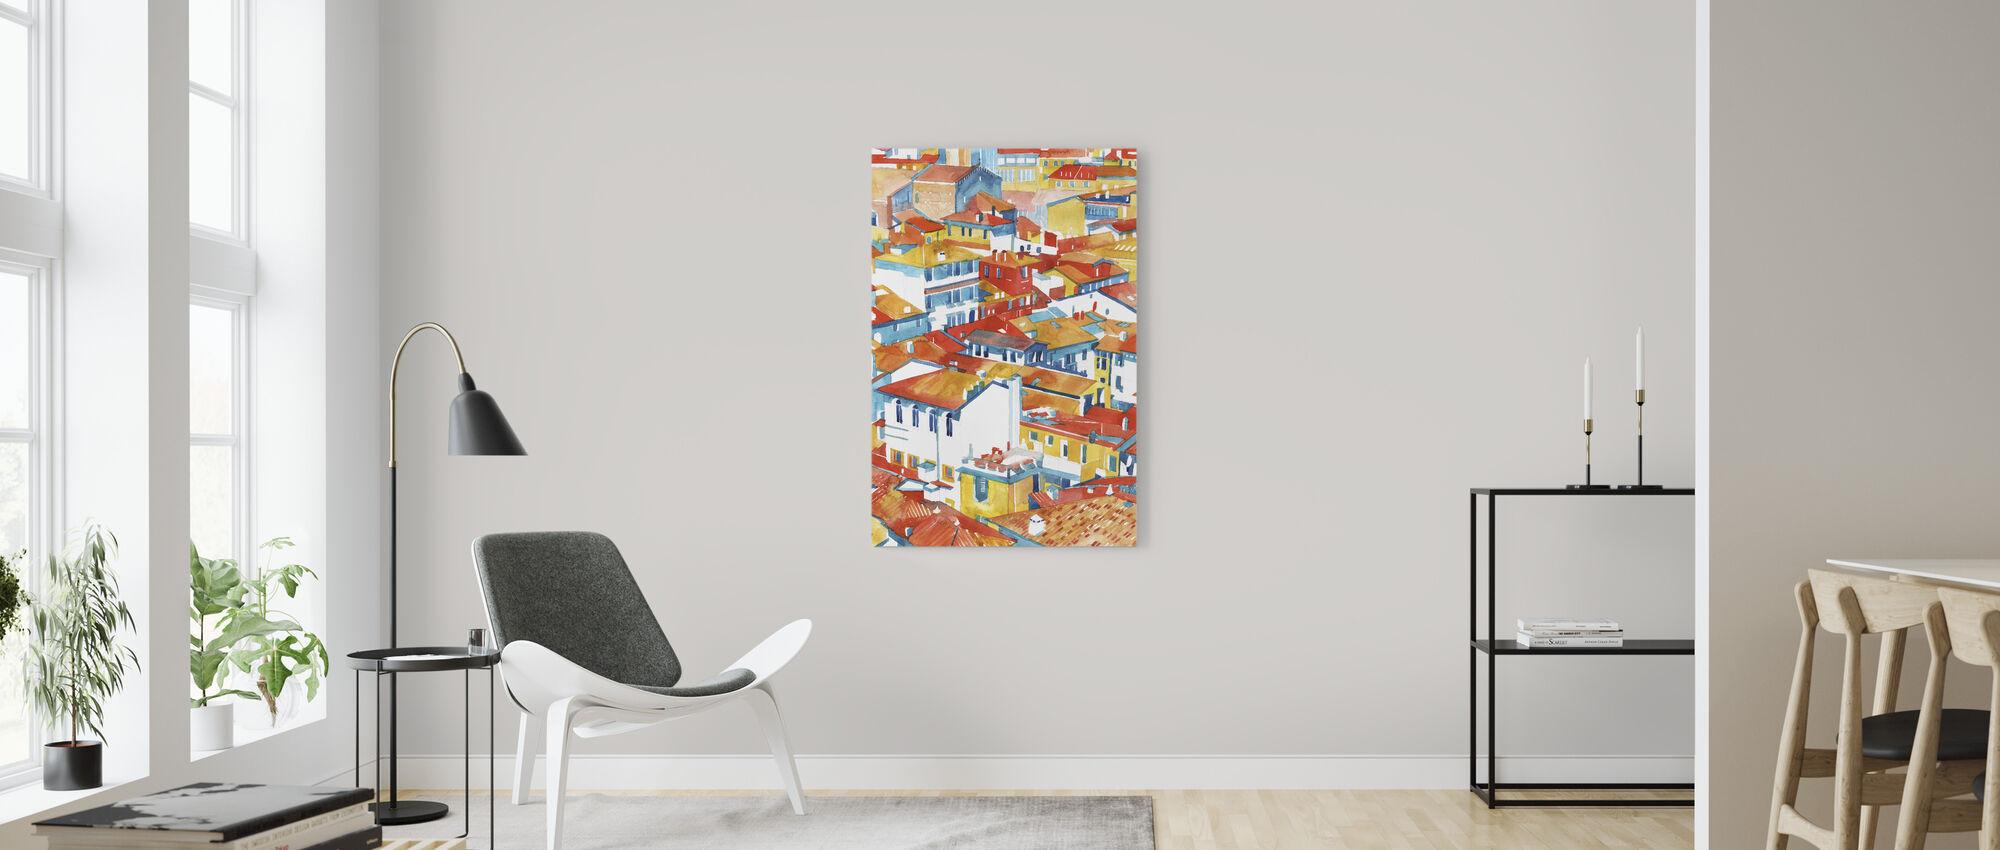 Verona Byggnader - Canvastavla - Vardagsrum